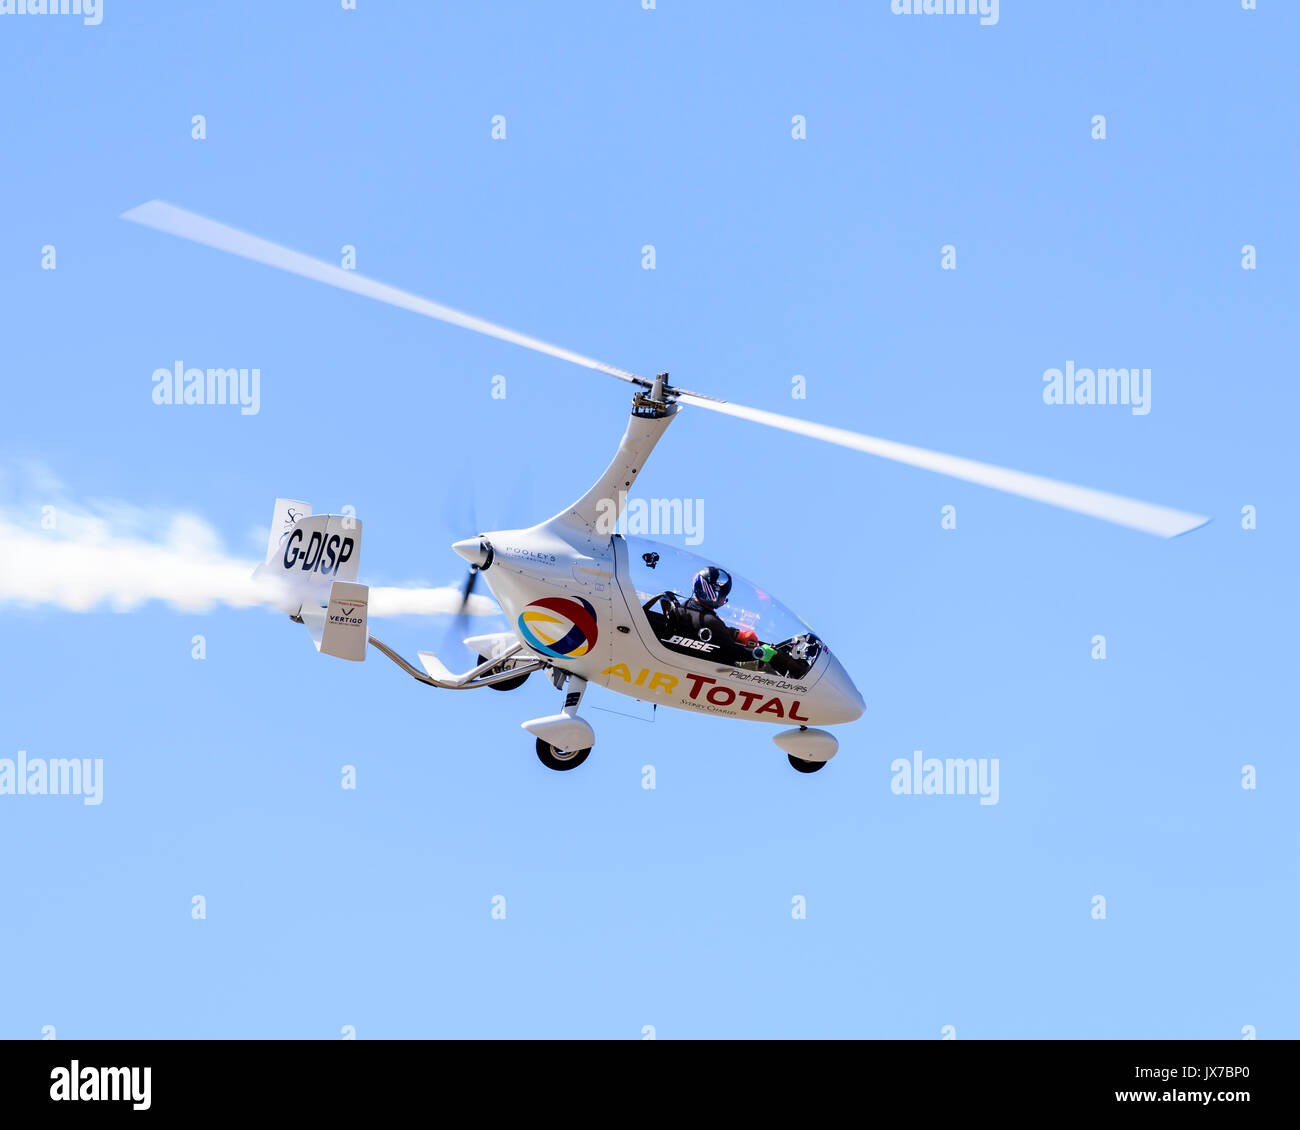 Peter Davies flying the Gyro Air Displays RotorSport Calidus Gyroplane -  Stock Image